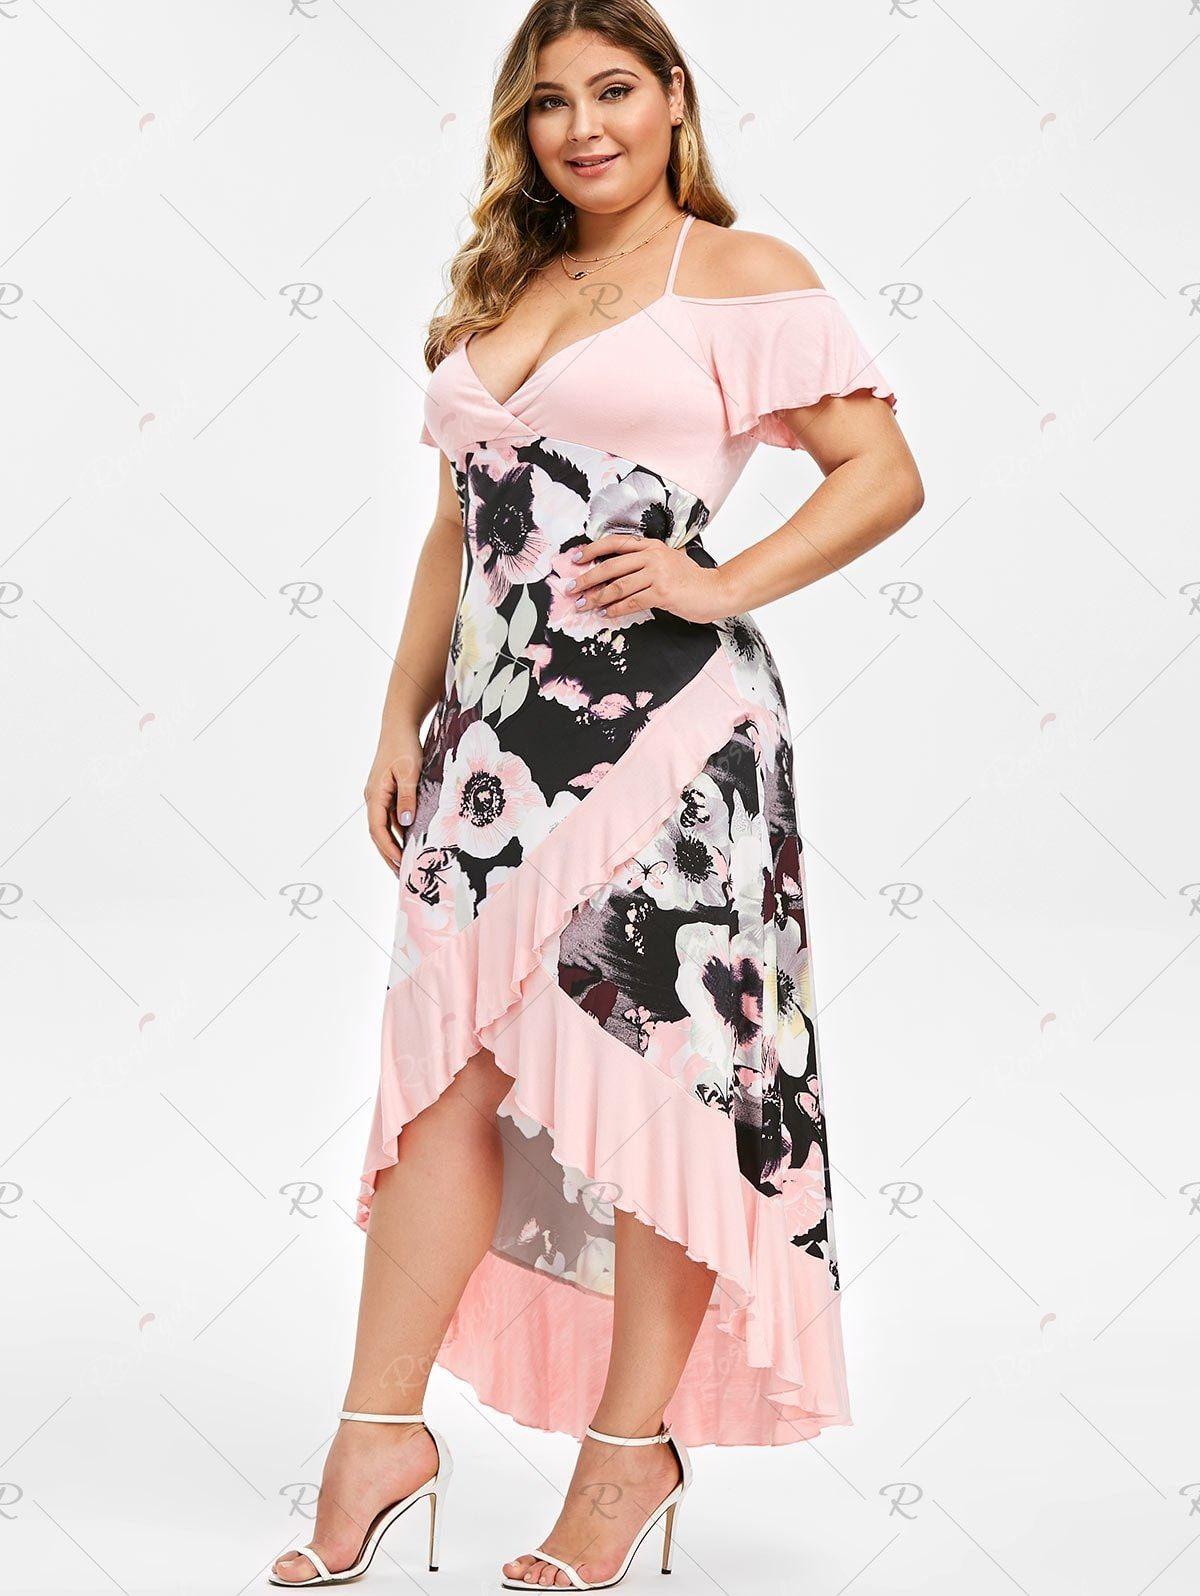 Plus Size High Low Cold Shoulder Ruffle Dress Shoulder Ruffle Dress Ruffle Dress Dresses [ 1596 x 1200 Pixel ]